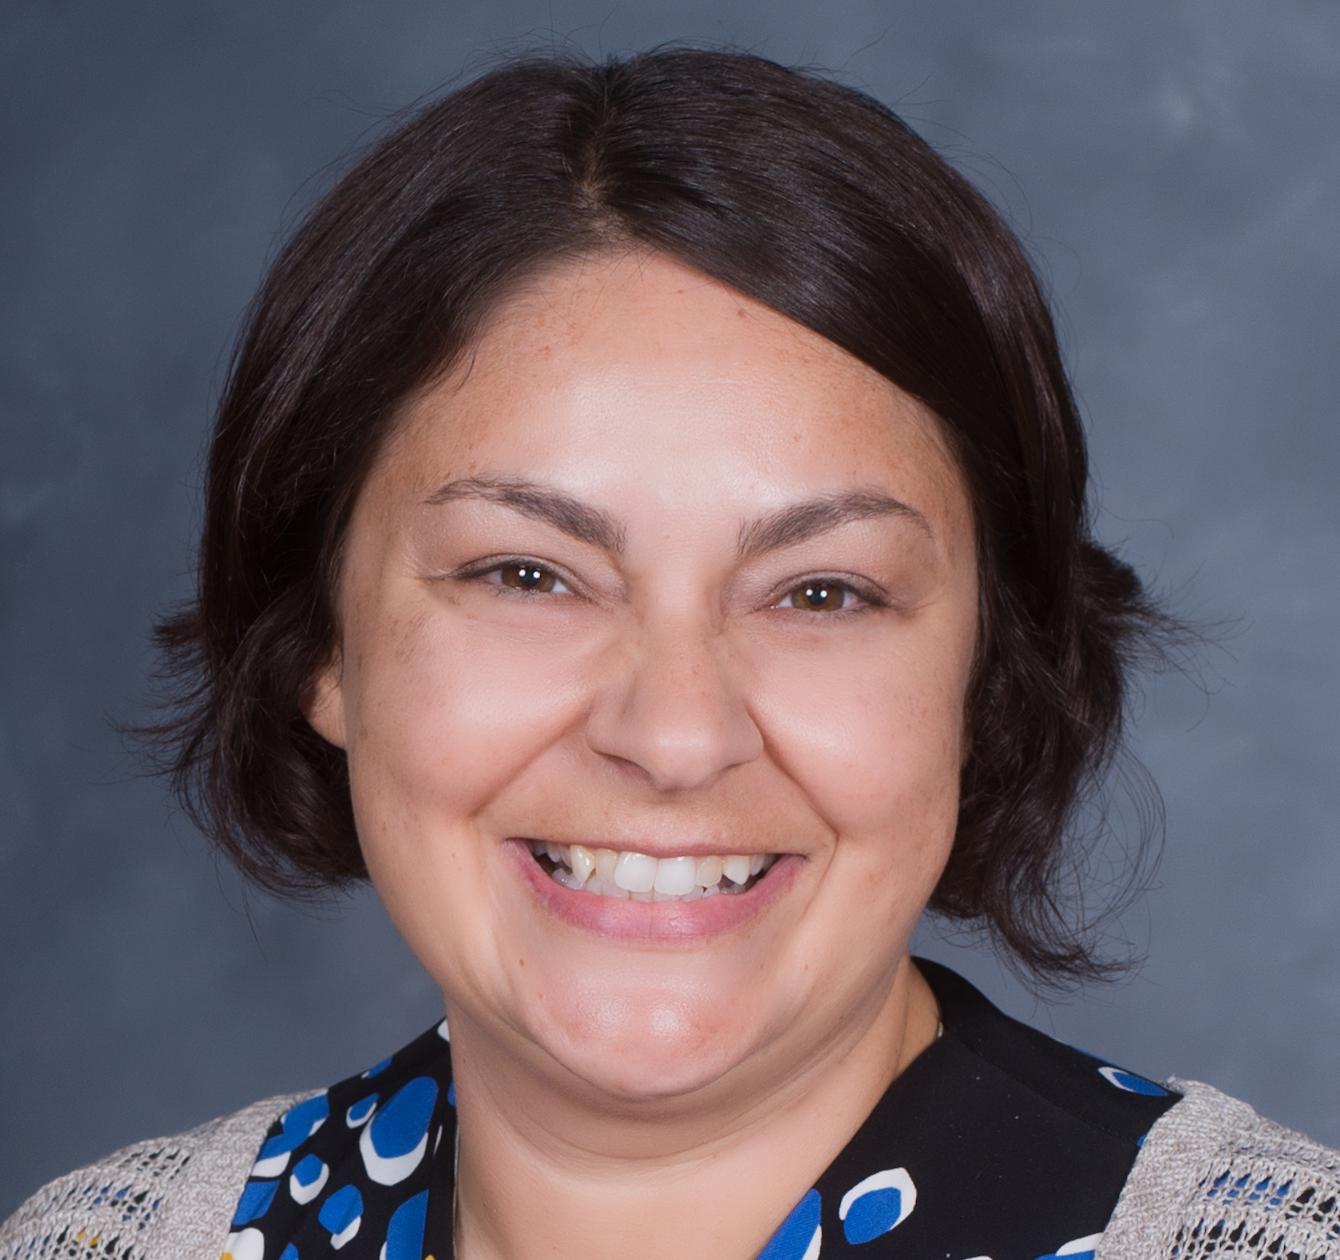 Mrs. Arcadio